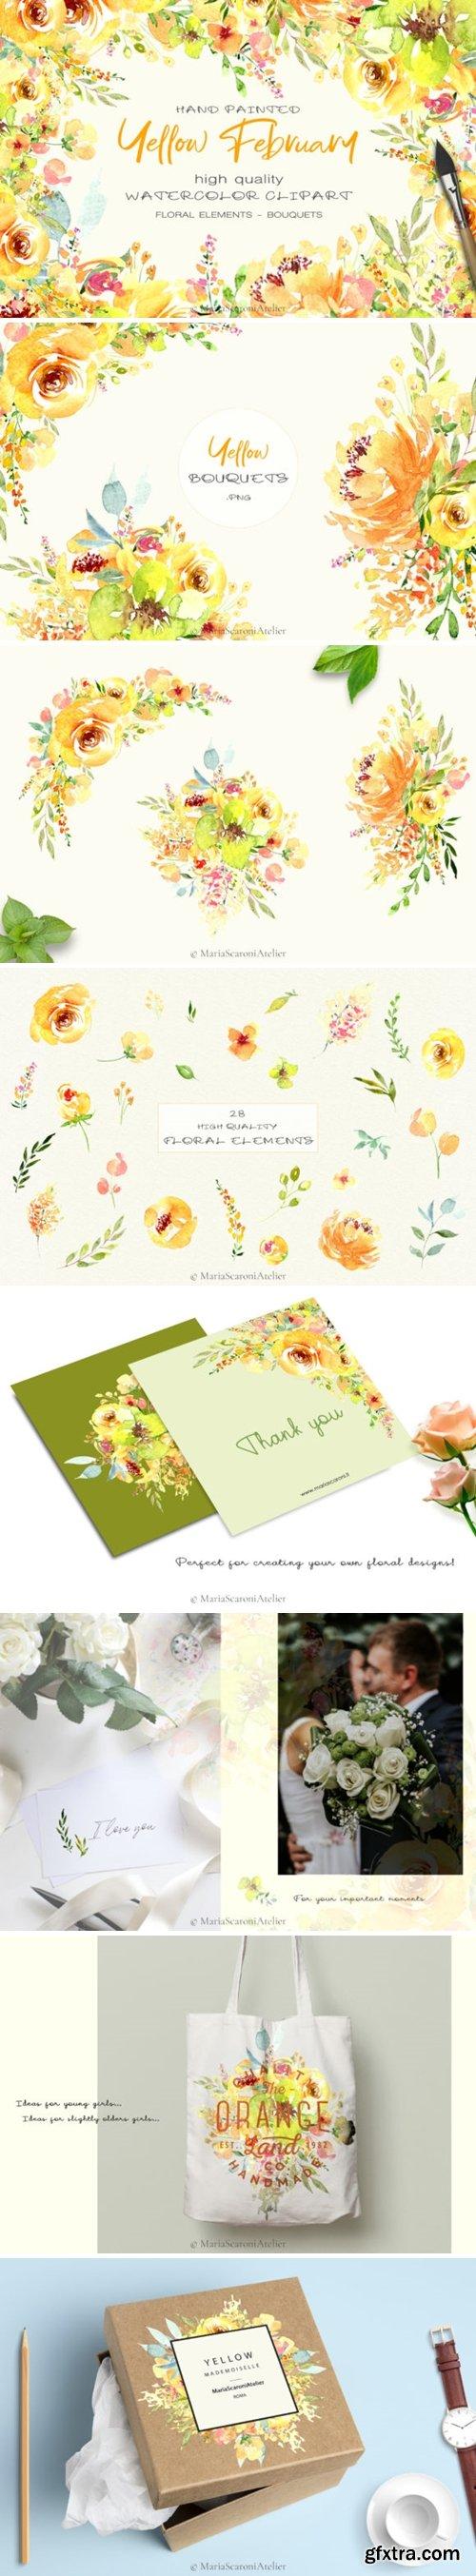 Watercolor Flowers 3016297